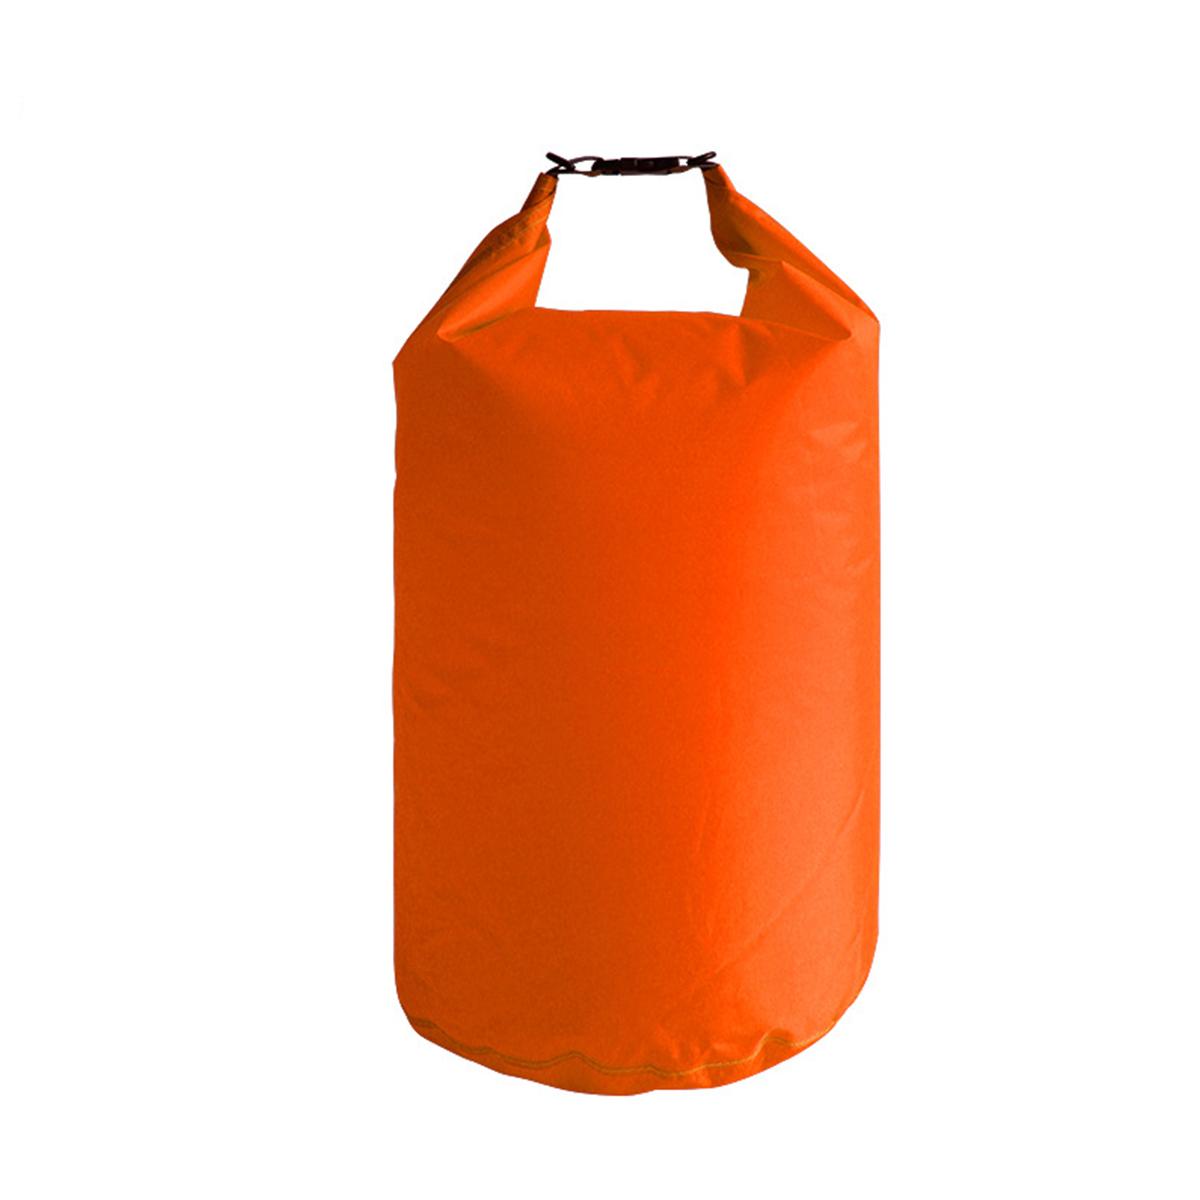 5L Floating Waterproof Dry Bag Roll Storage Bag Rucksack Outdoor Camping Travel Kayak Canoeing Fishing Sailing Drift Bag